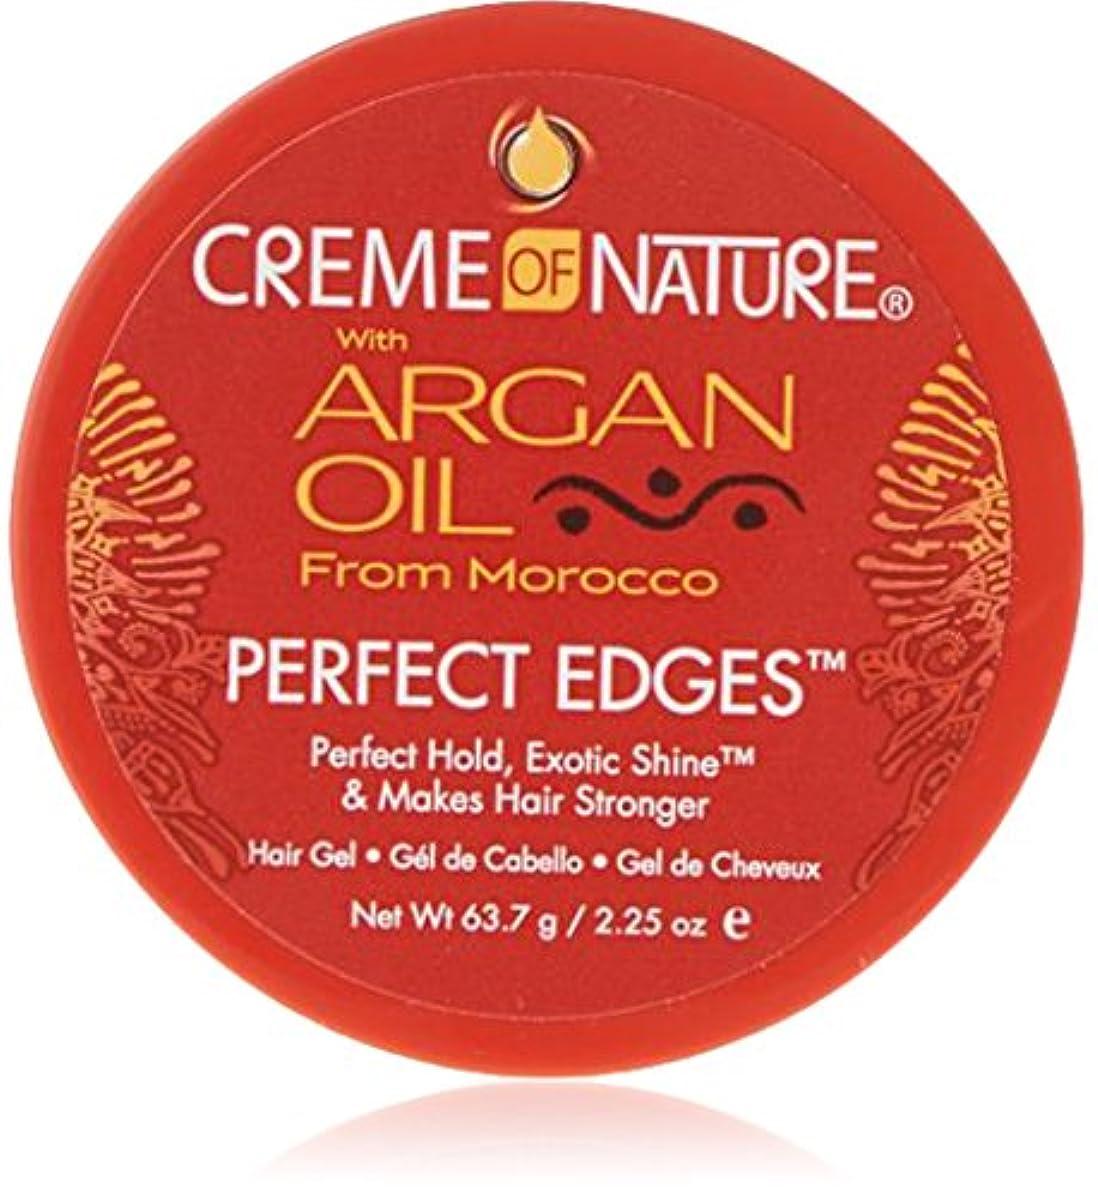 Creme of Nature Argan Oil Perfect Edges Control 64g Jar (並行輸入品)